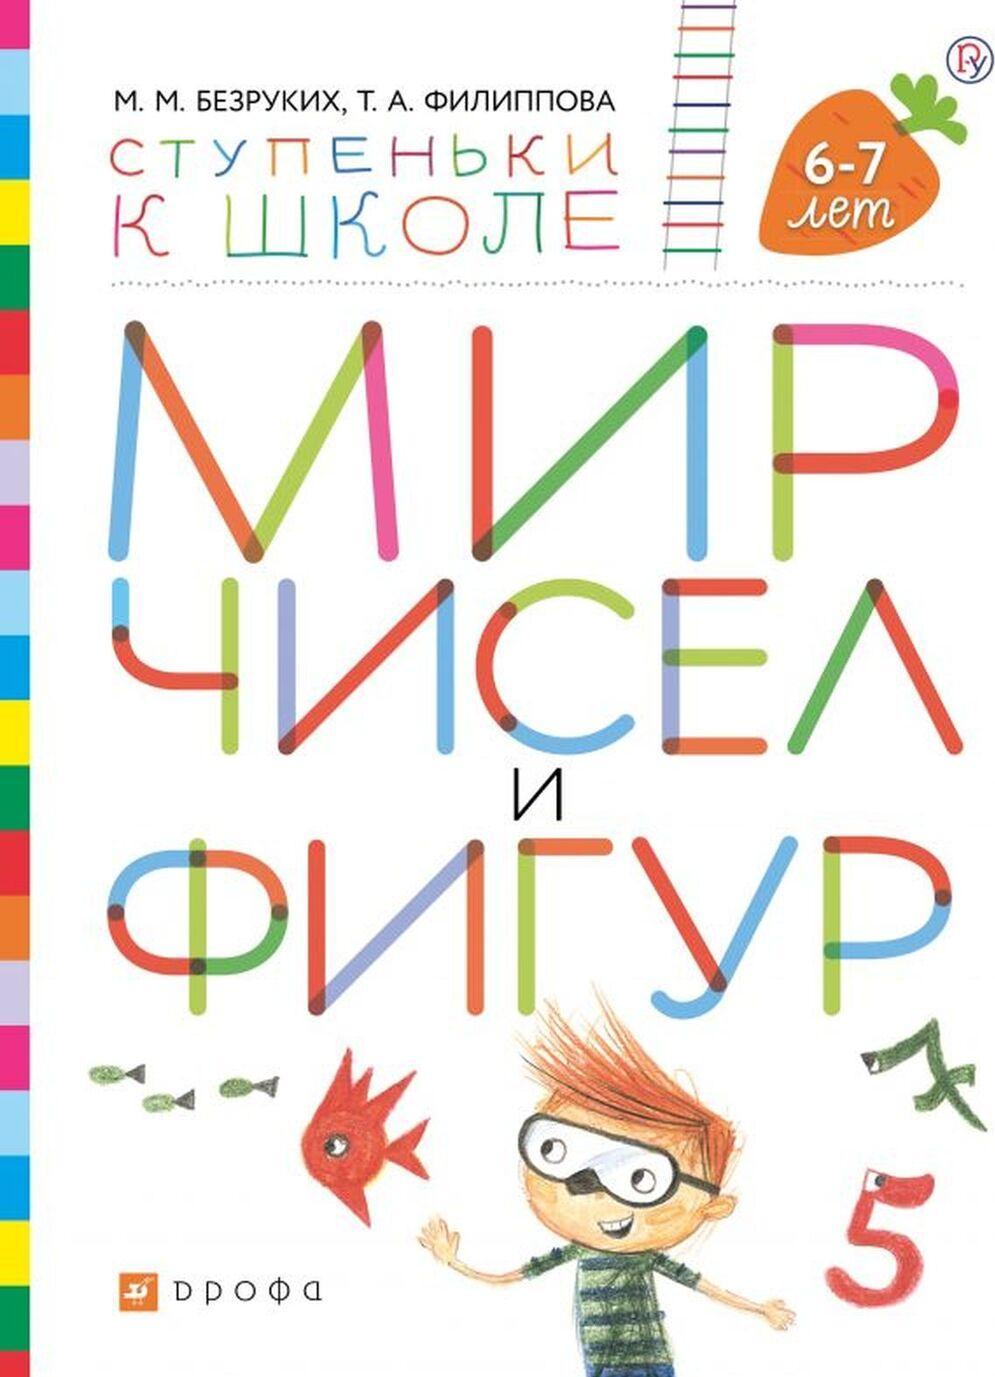 Mir chisel i figur. Posobie dlja detej 6-7 let | Bezrukikh Marjana Mikhajlovna, Filippova Tatjana Andreevna